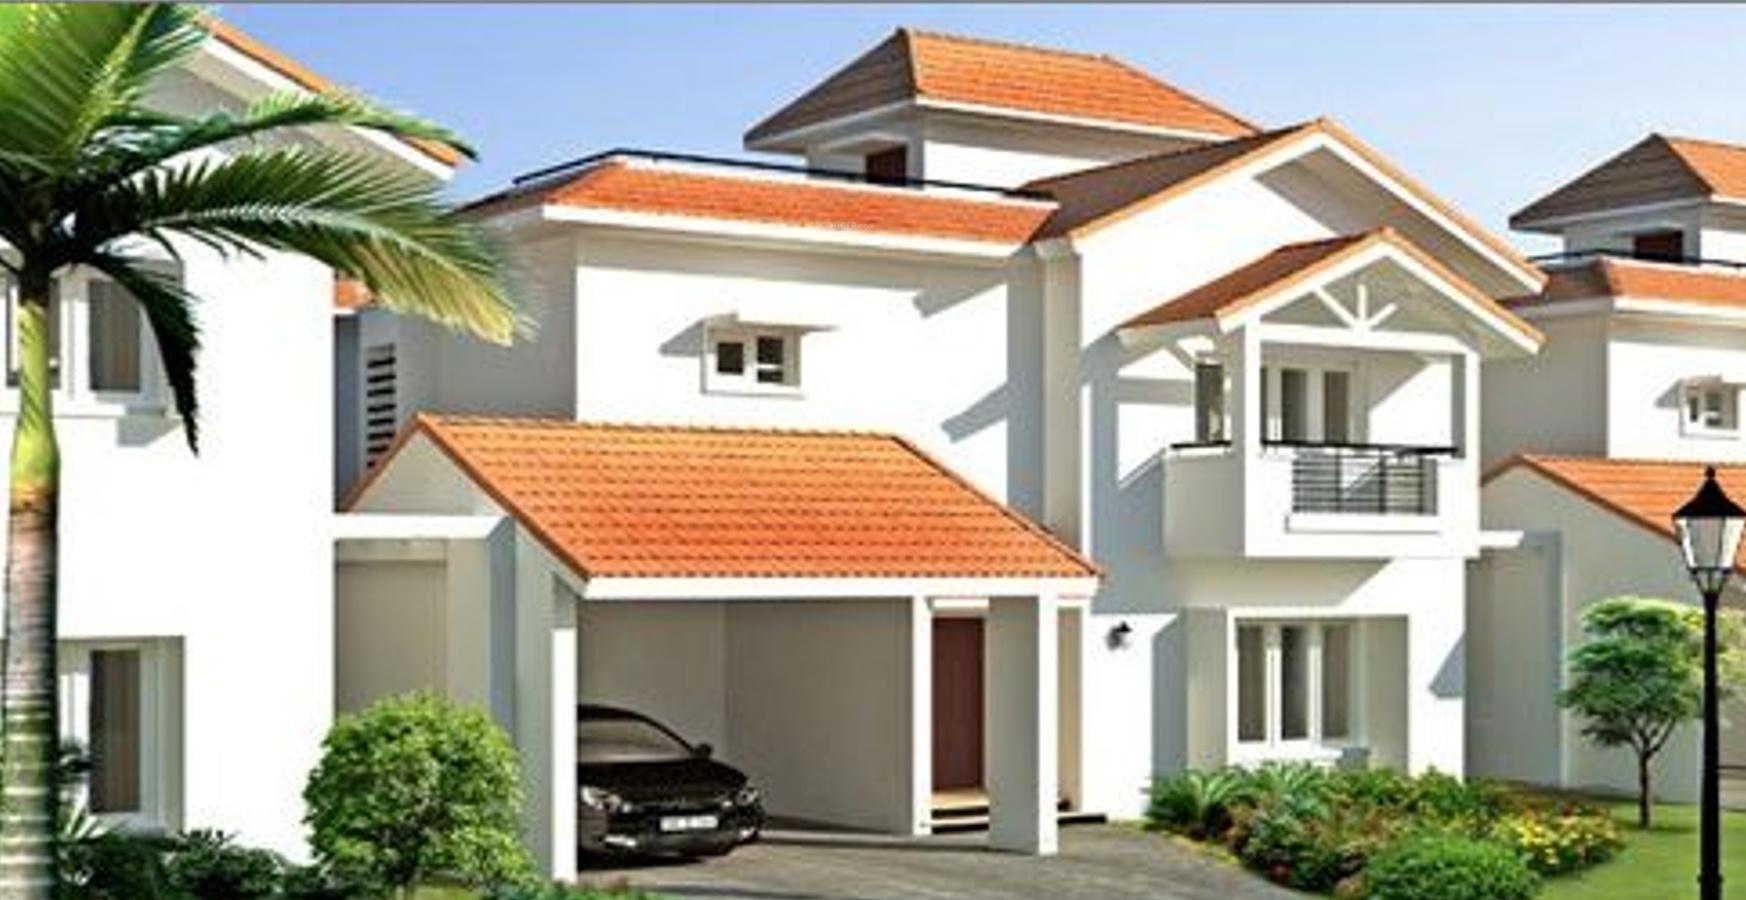 2020 sq ft 3 bhk 3t villa for sale in jrd realtorss smart homes kovai pudur coimbatore. Black Bedroom Furniture Sets. Home Design Ideas